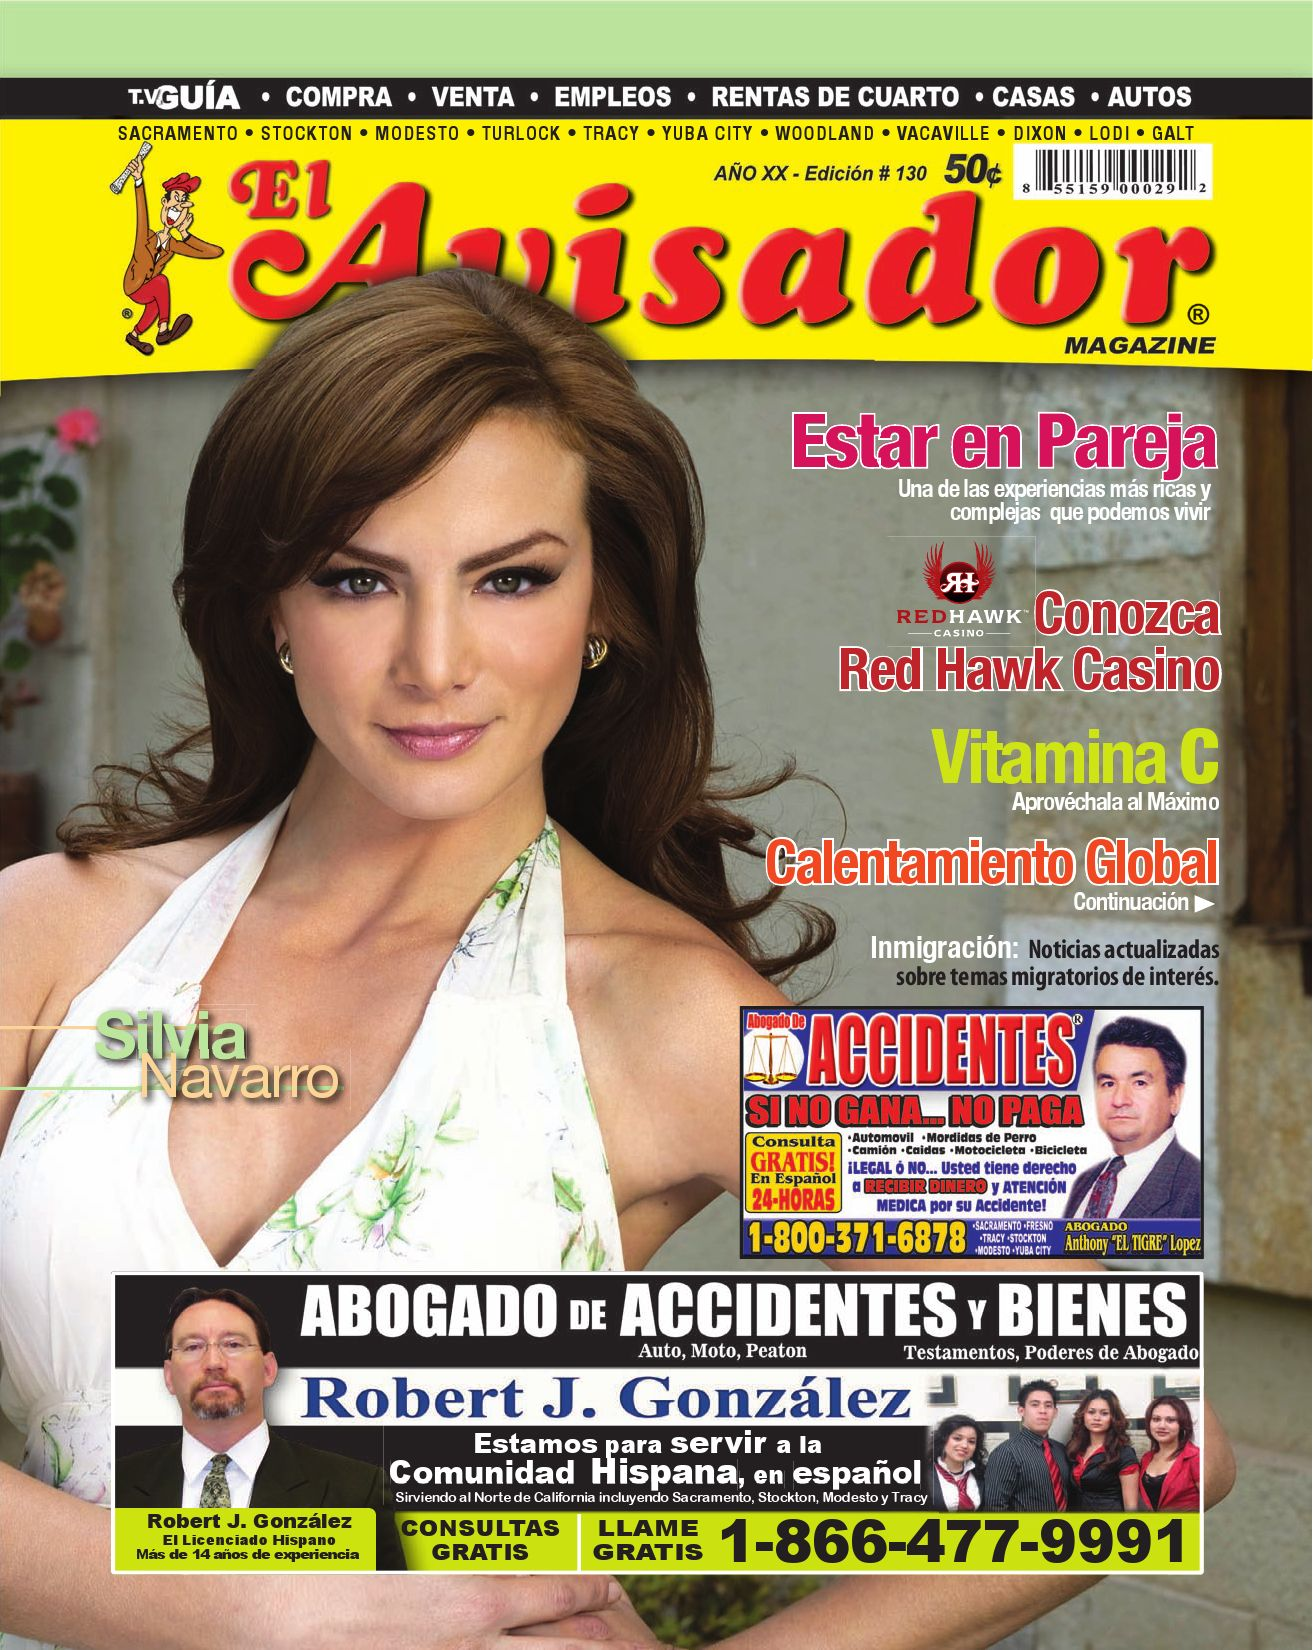 Yuba City Nissan >> Avisador Magazine | Edicion 130 by Avisador Magazine - issuu